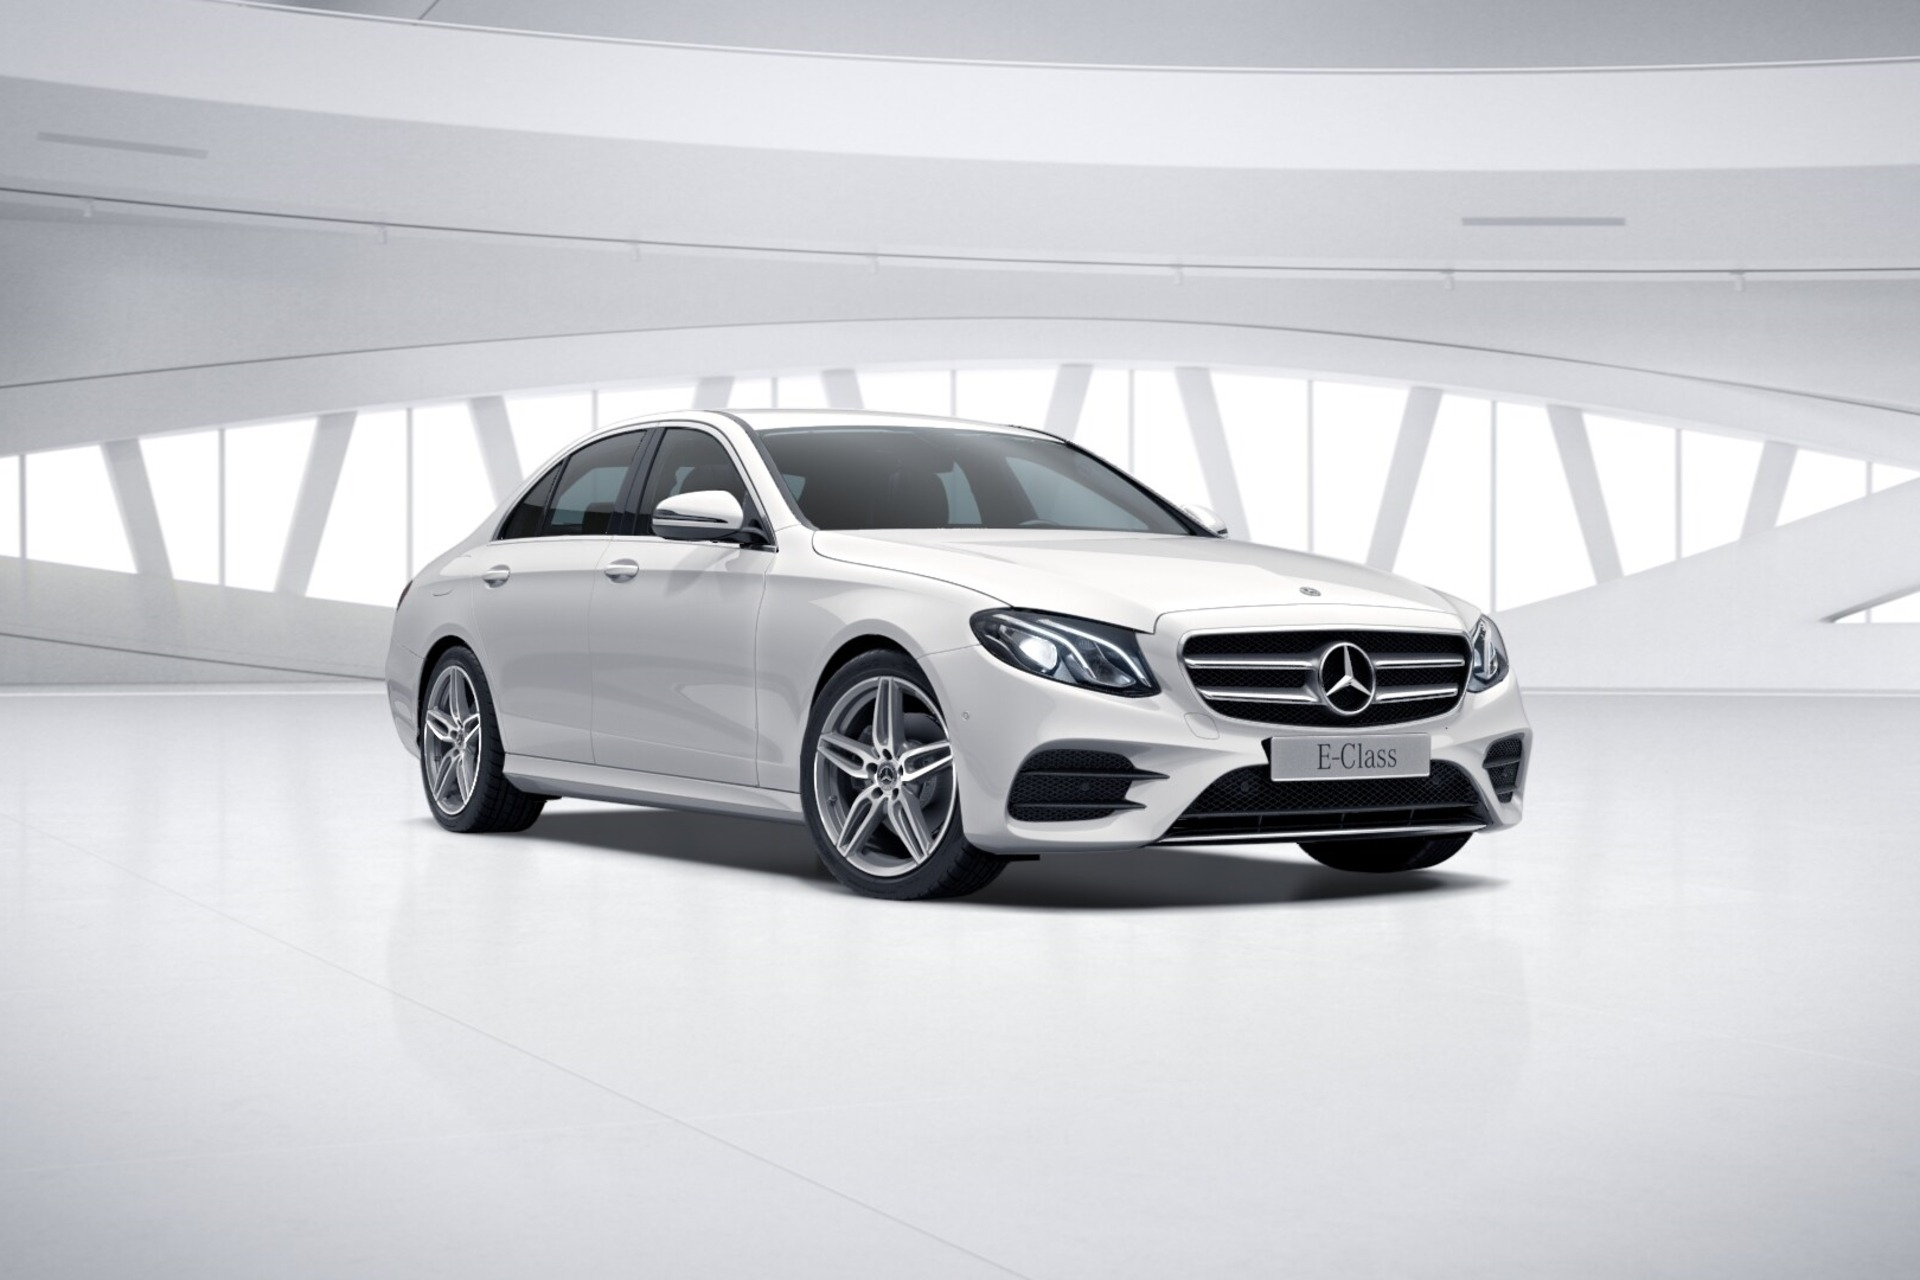 Mercedes-Benz E-Class Limousine 952611386